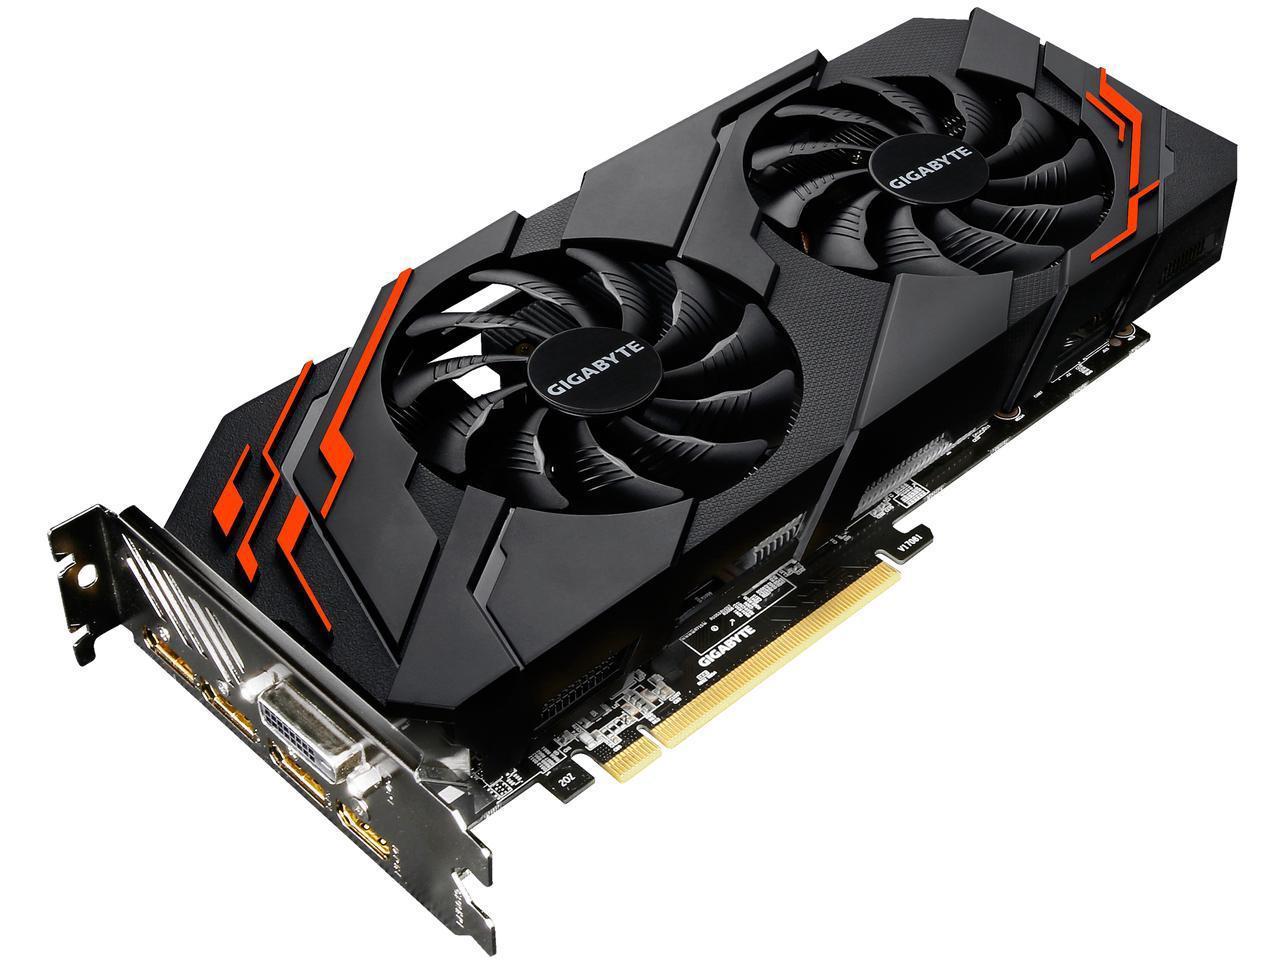 GIGABYTE GeForce GTX 1070 Ti  Newegg.com $509.99